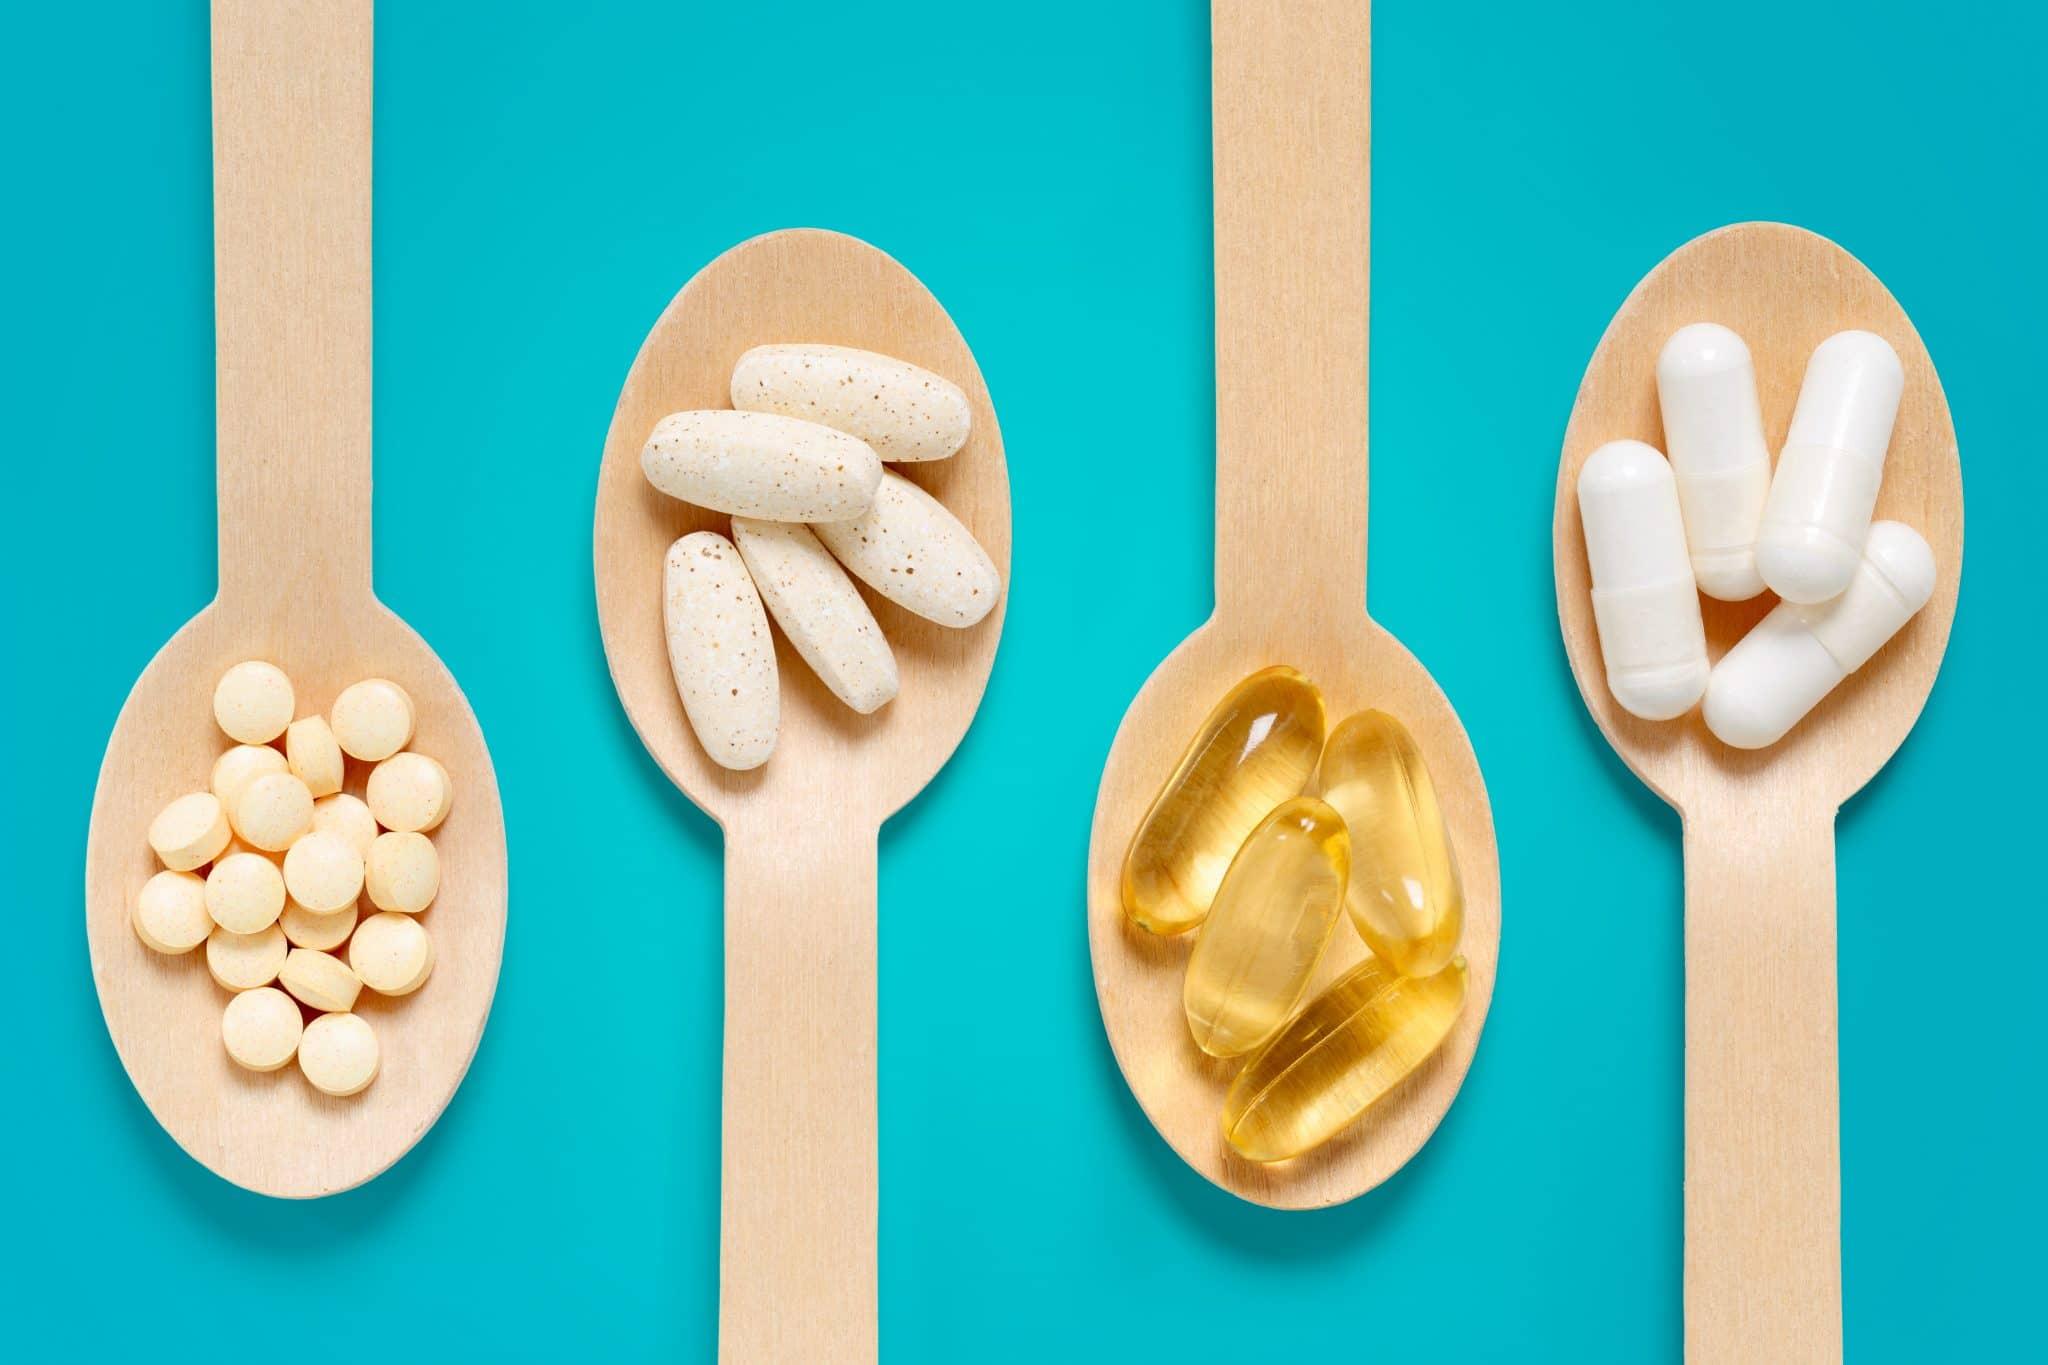 Vitamin-D-Pr-parate-unn-tig-oder-sinnvoll-